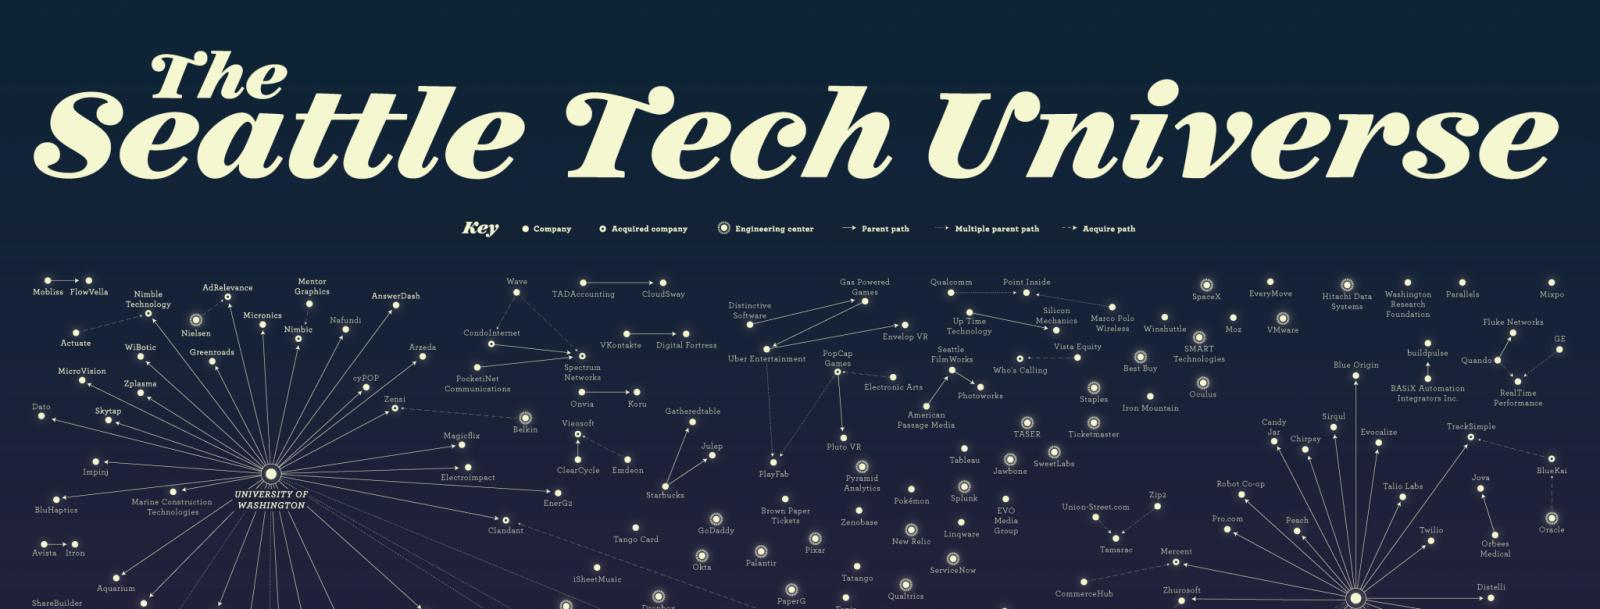 TechUniverse-webbanner